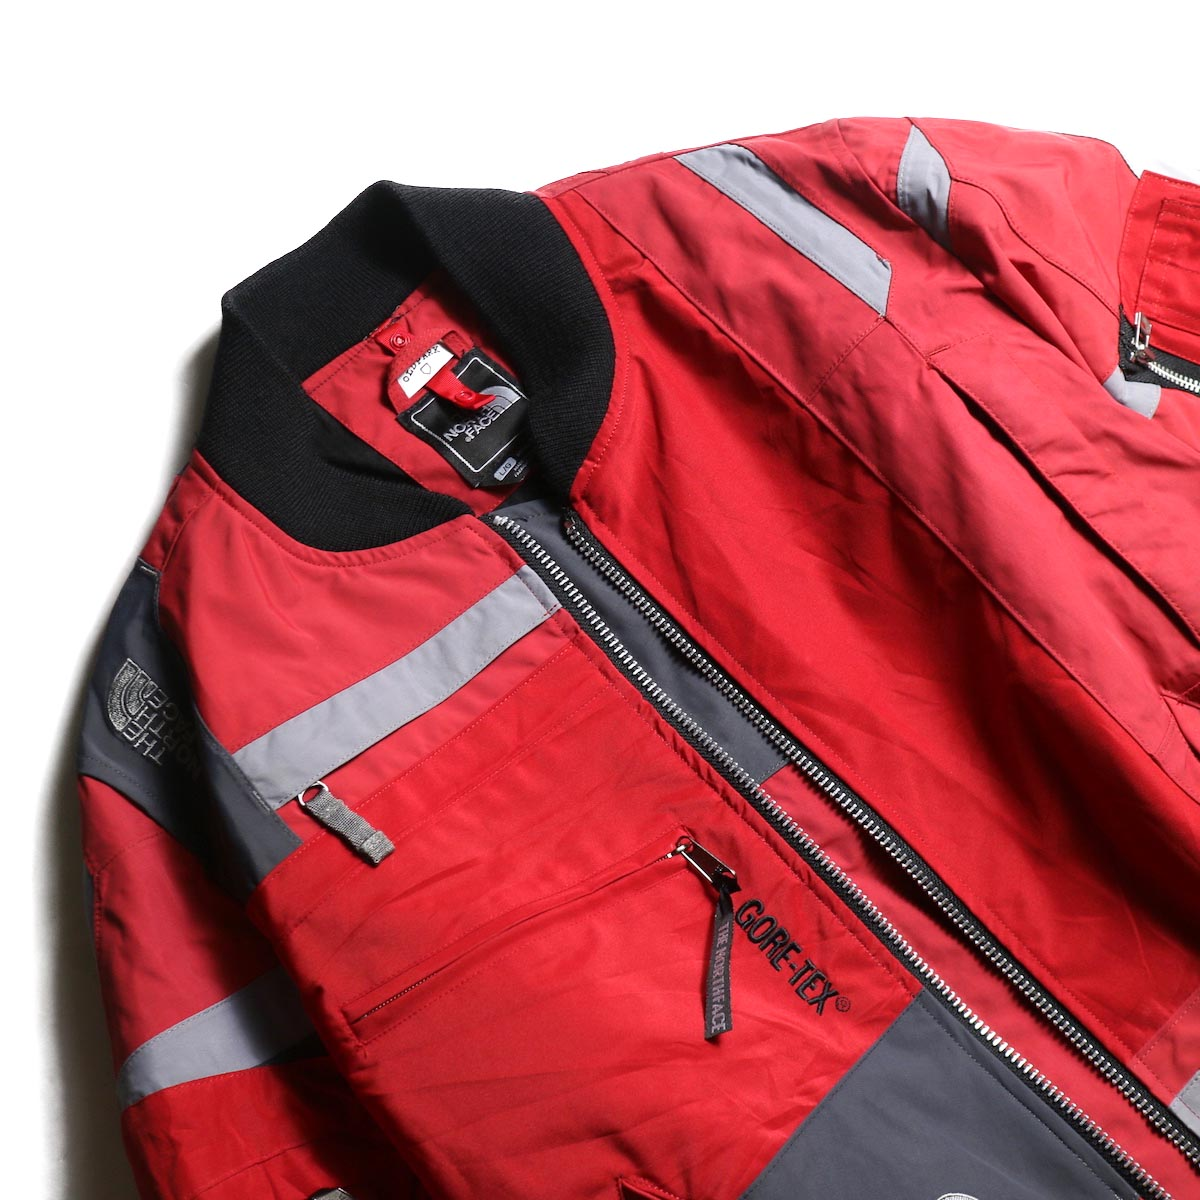 OLD PARK / Flight Jacket (OUTDOOR)(Lsize) 襟